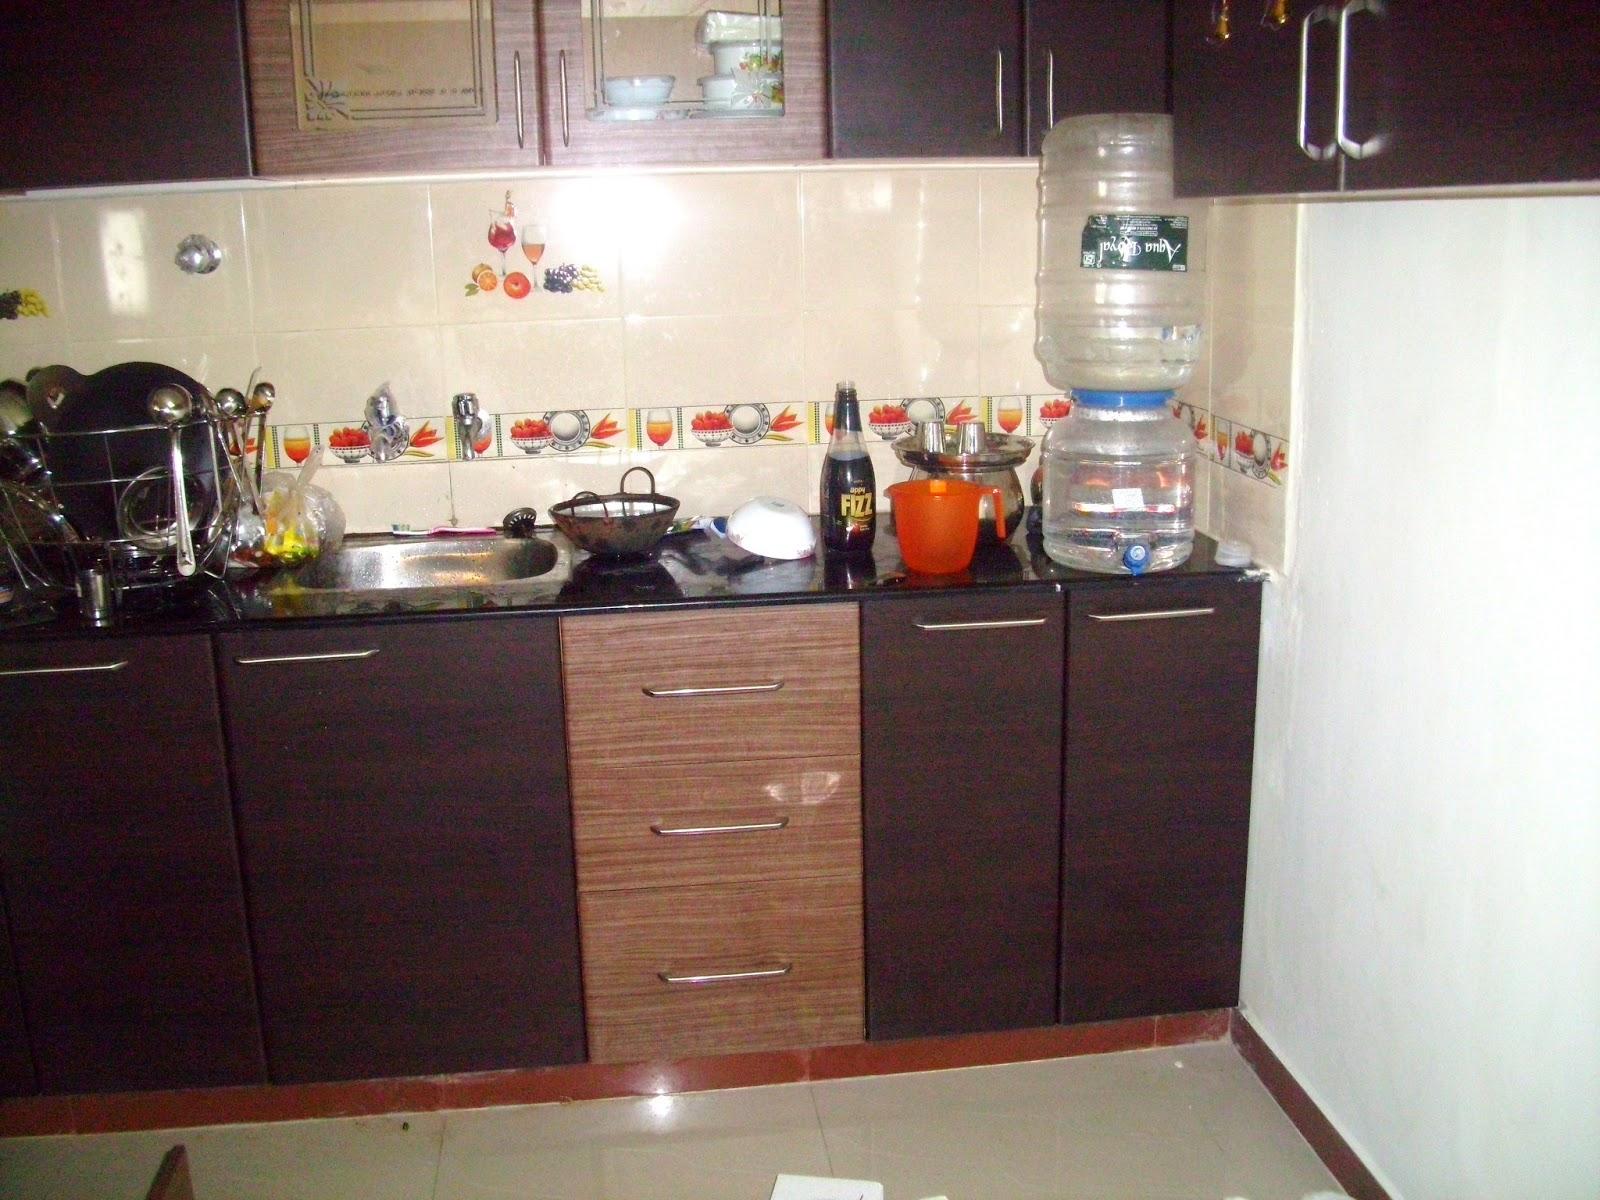 Modular Kitchen Designers In Chennai on modular kitchen in hyderabad, modular kitchen in mumbai, modular kitchen in bangalore, modular kitchen in kerala, marriage halls in chennai,